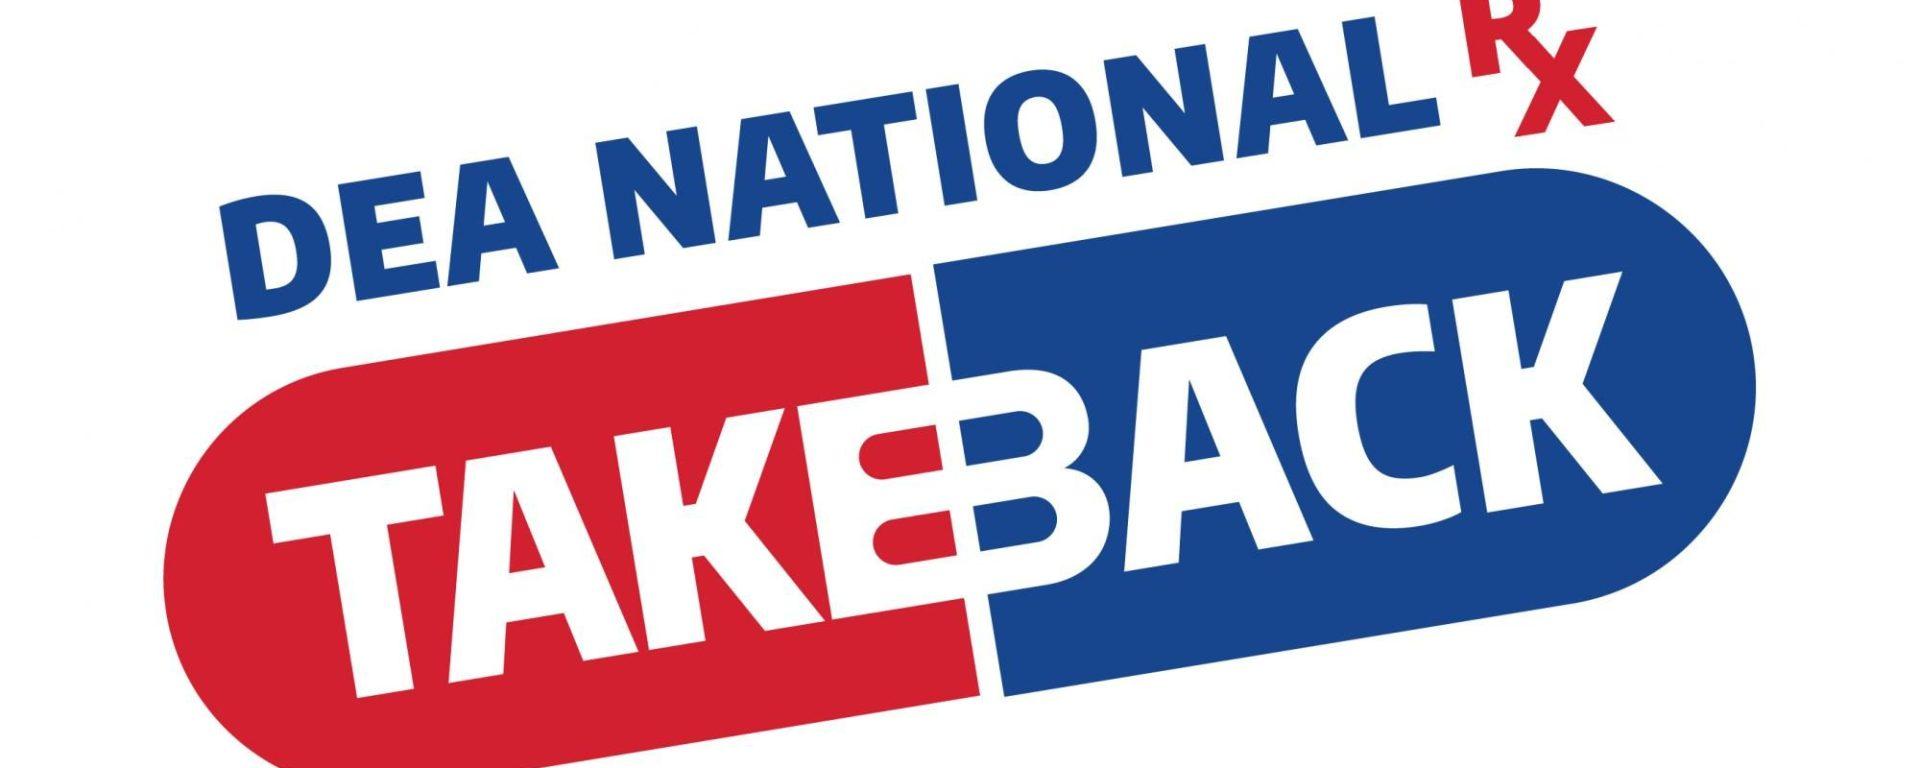 DEA National Prescription Take Back logo